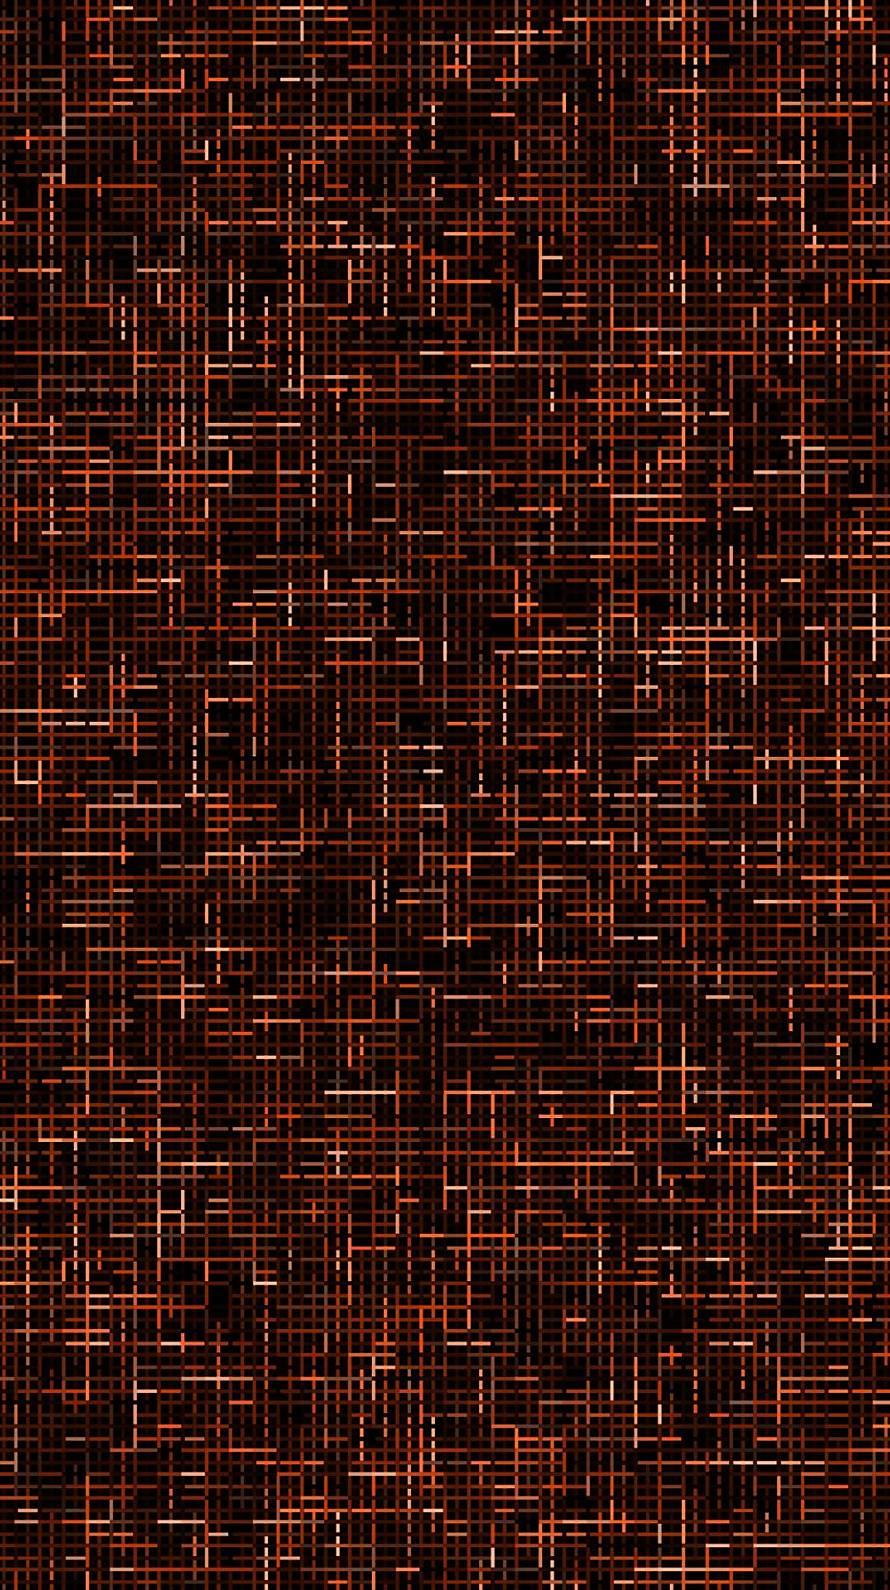 幾何学模様 Iphone6壁紙 Wallpaperbox